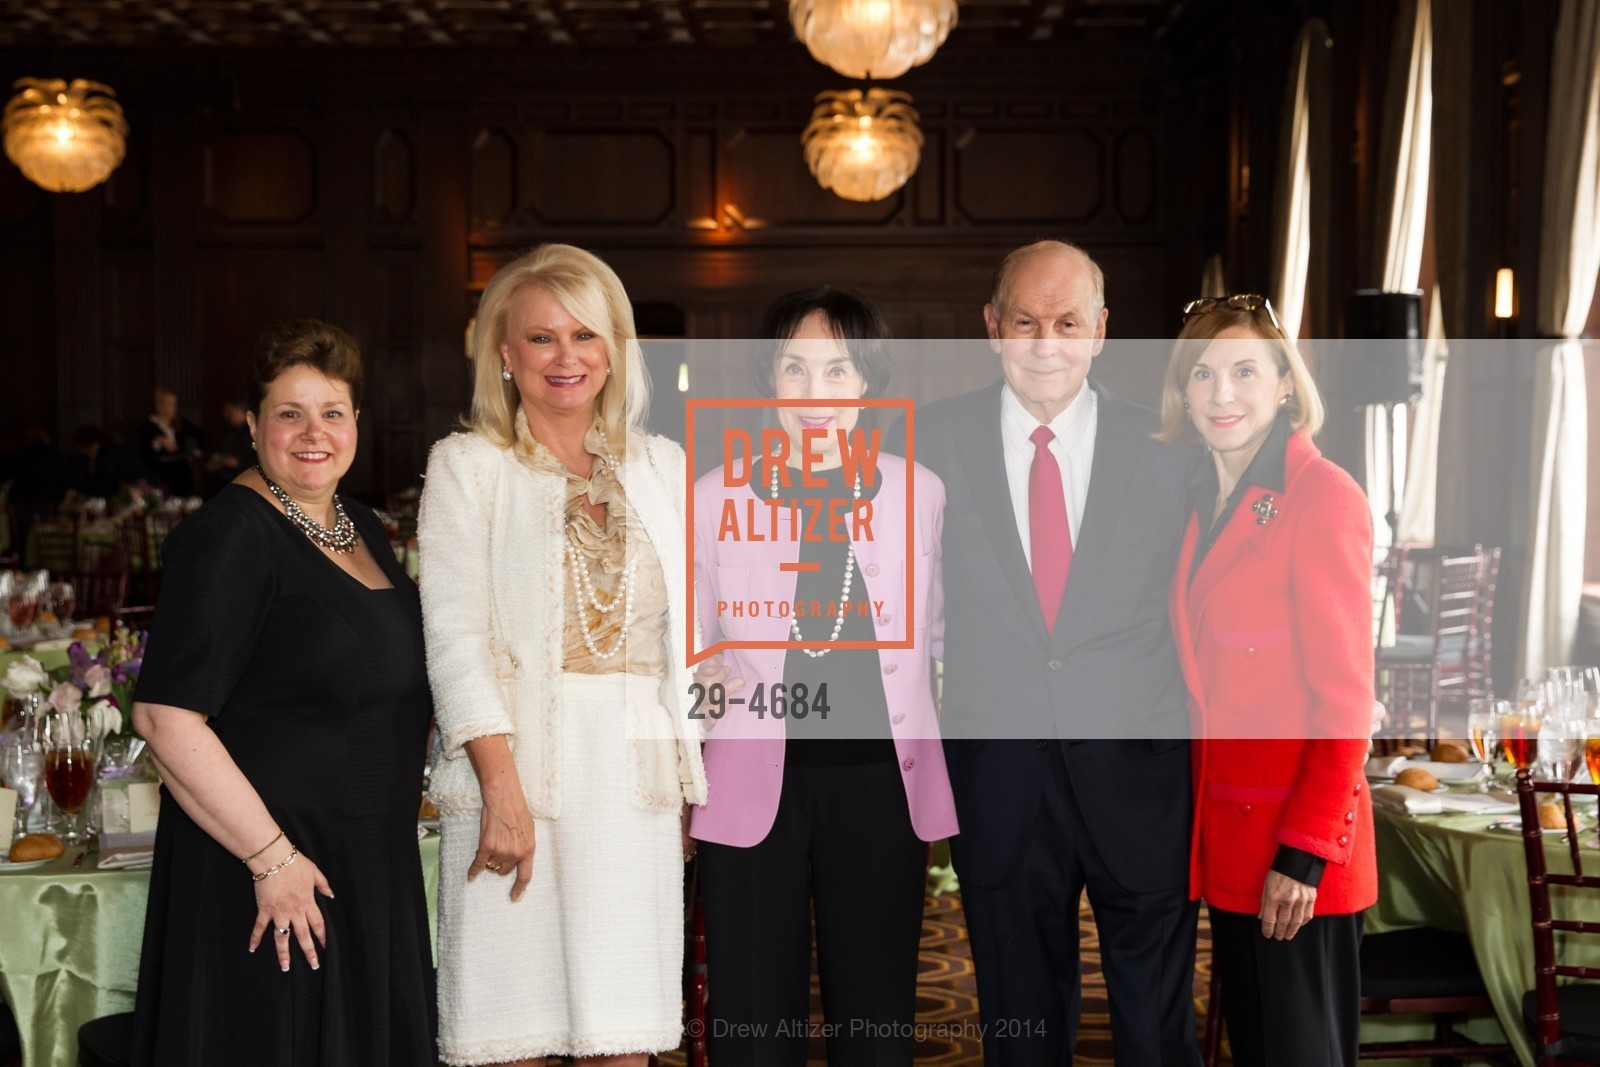 Tammy Braas-Hill, Chandra Friese, Merle Zellerbach, Lee Munson, Marsha Monro, Photo #29-4684